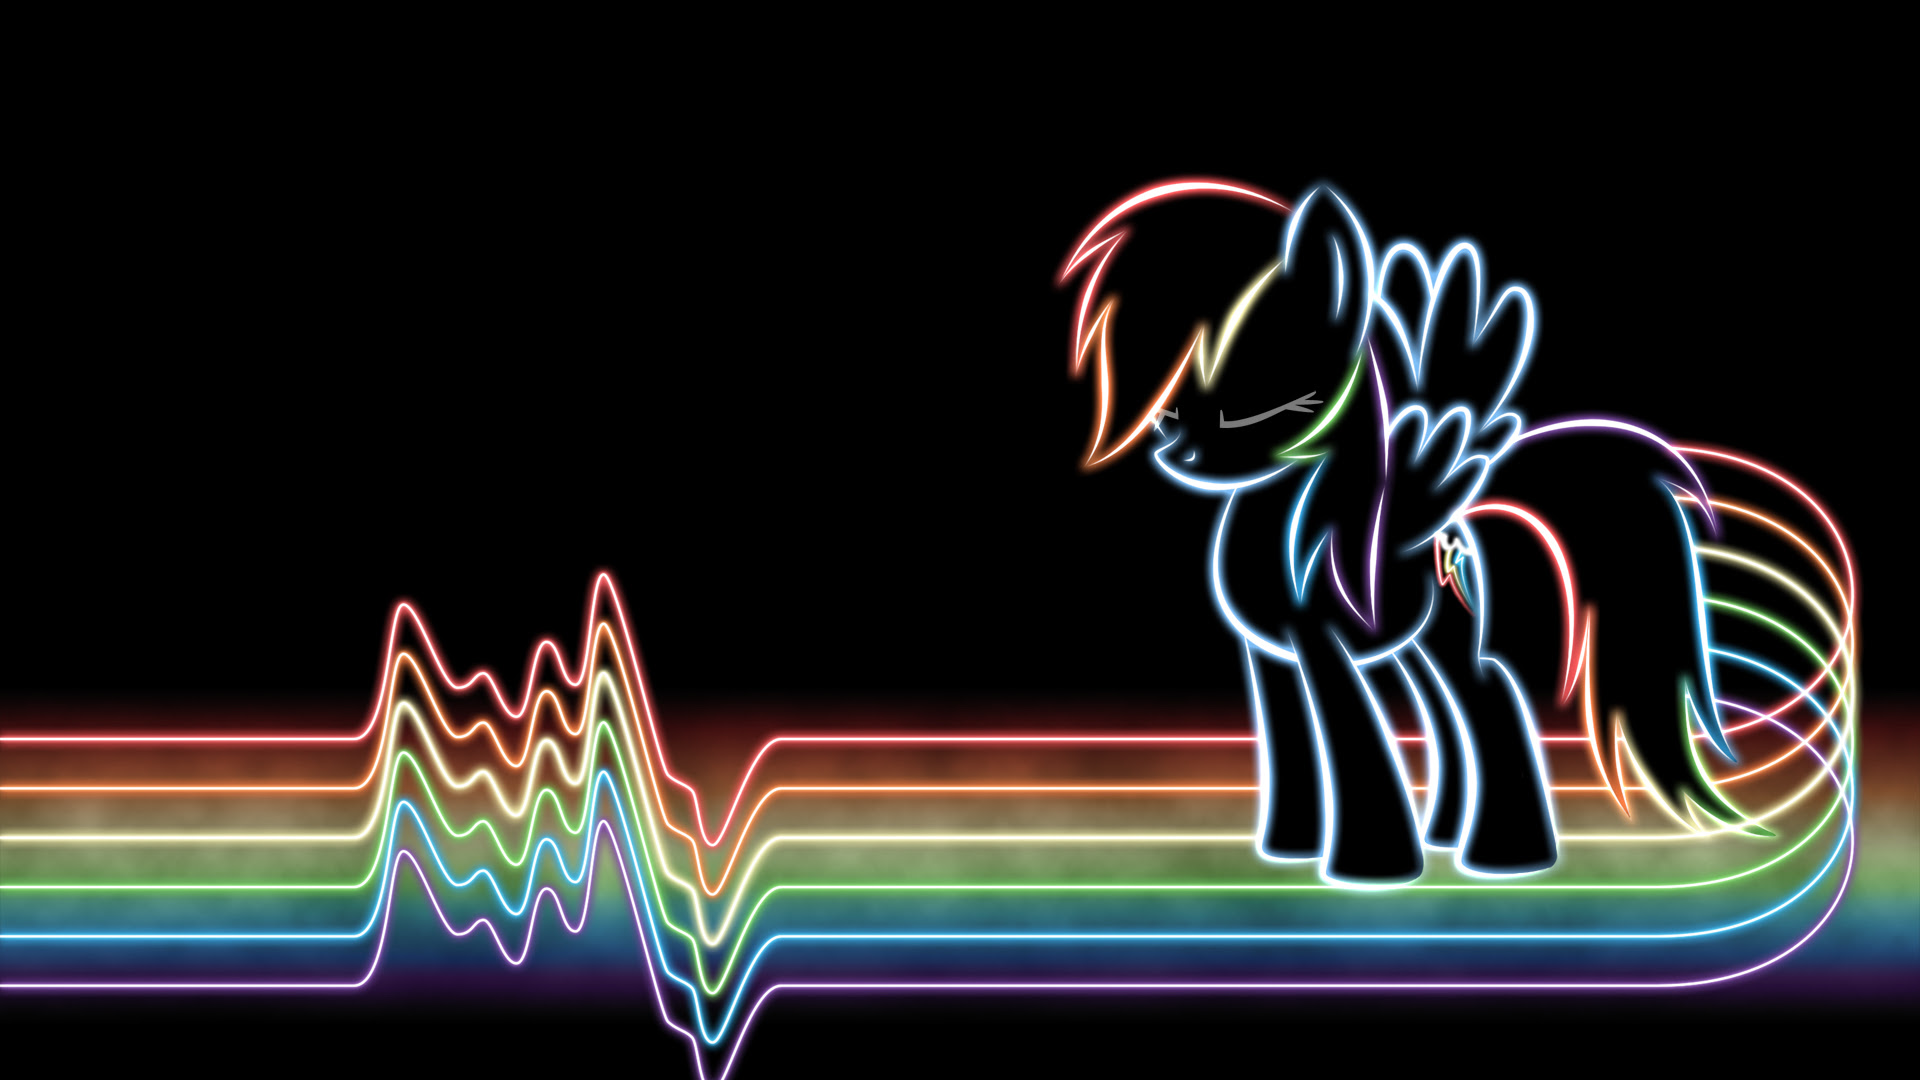 My Little Pony Wallpaper My Little Pony Friendship Is Magic